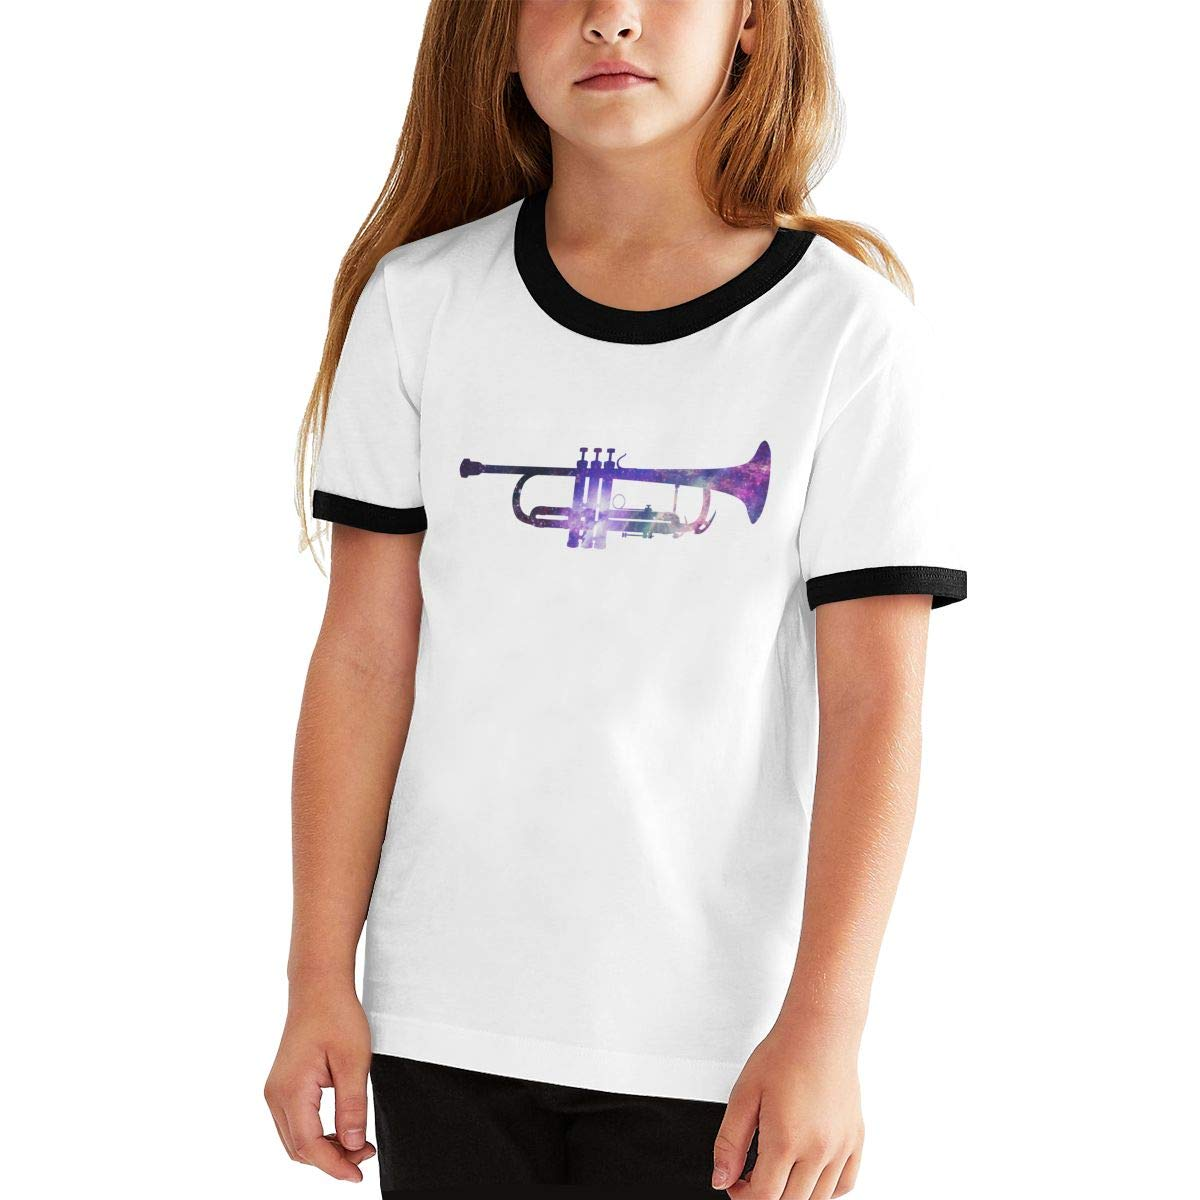 Kids Or Little Boys and Girls Galaxy Trumpet Art Unisex Childrens Short Sleeve T-Shirt